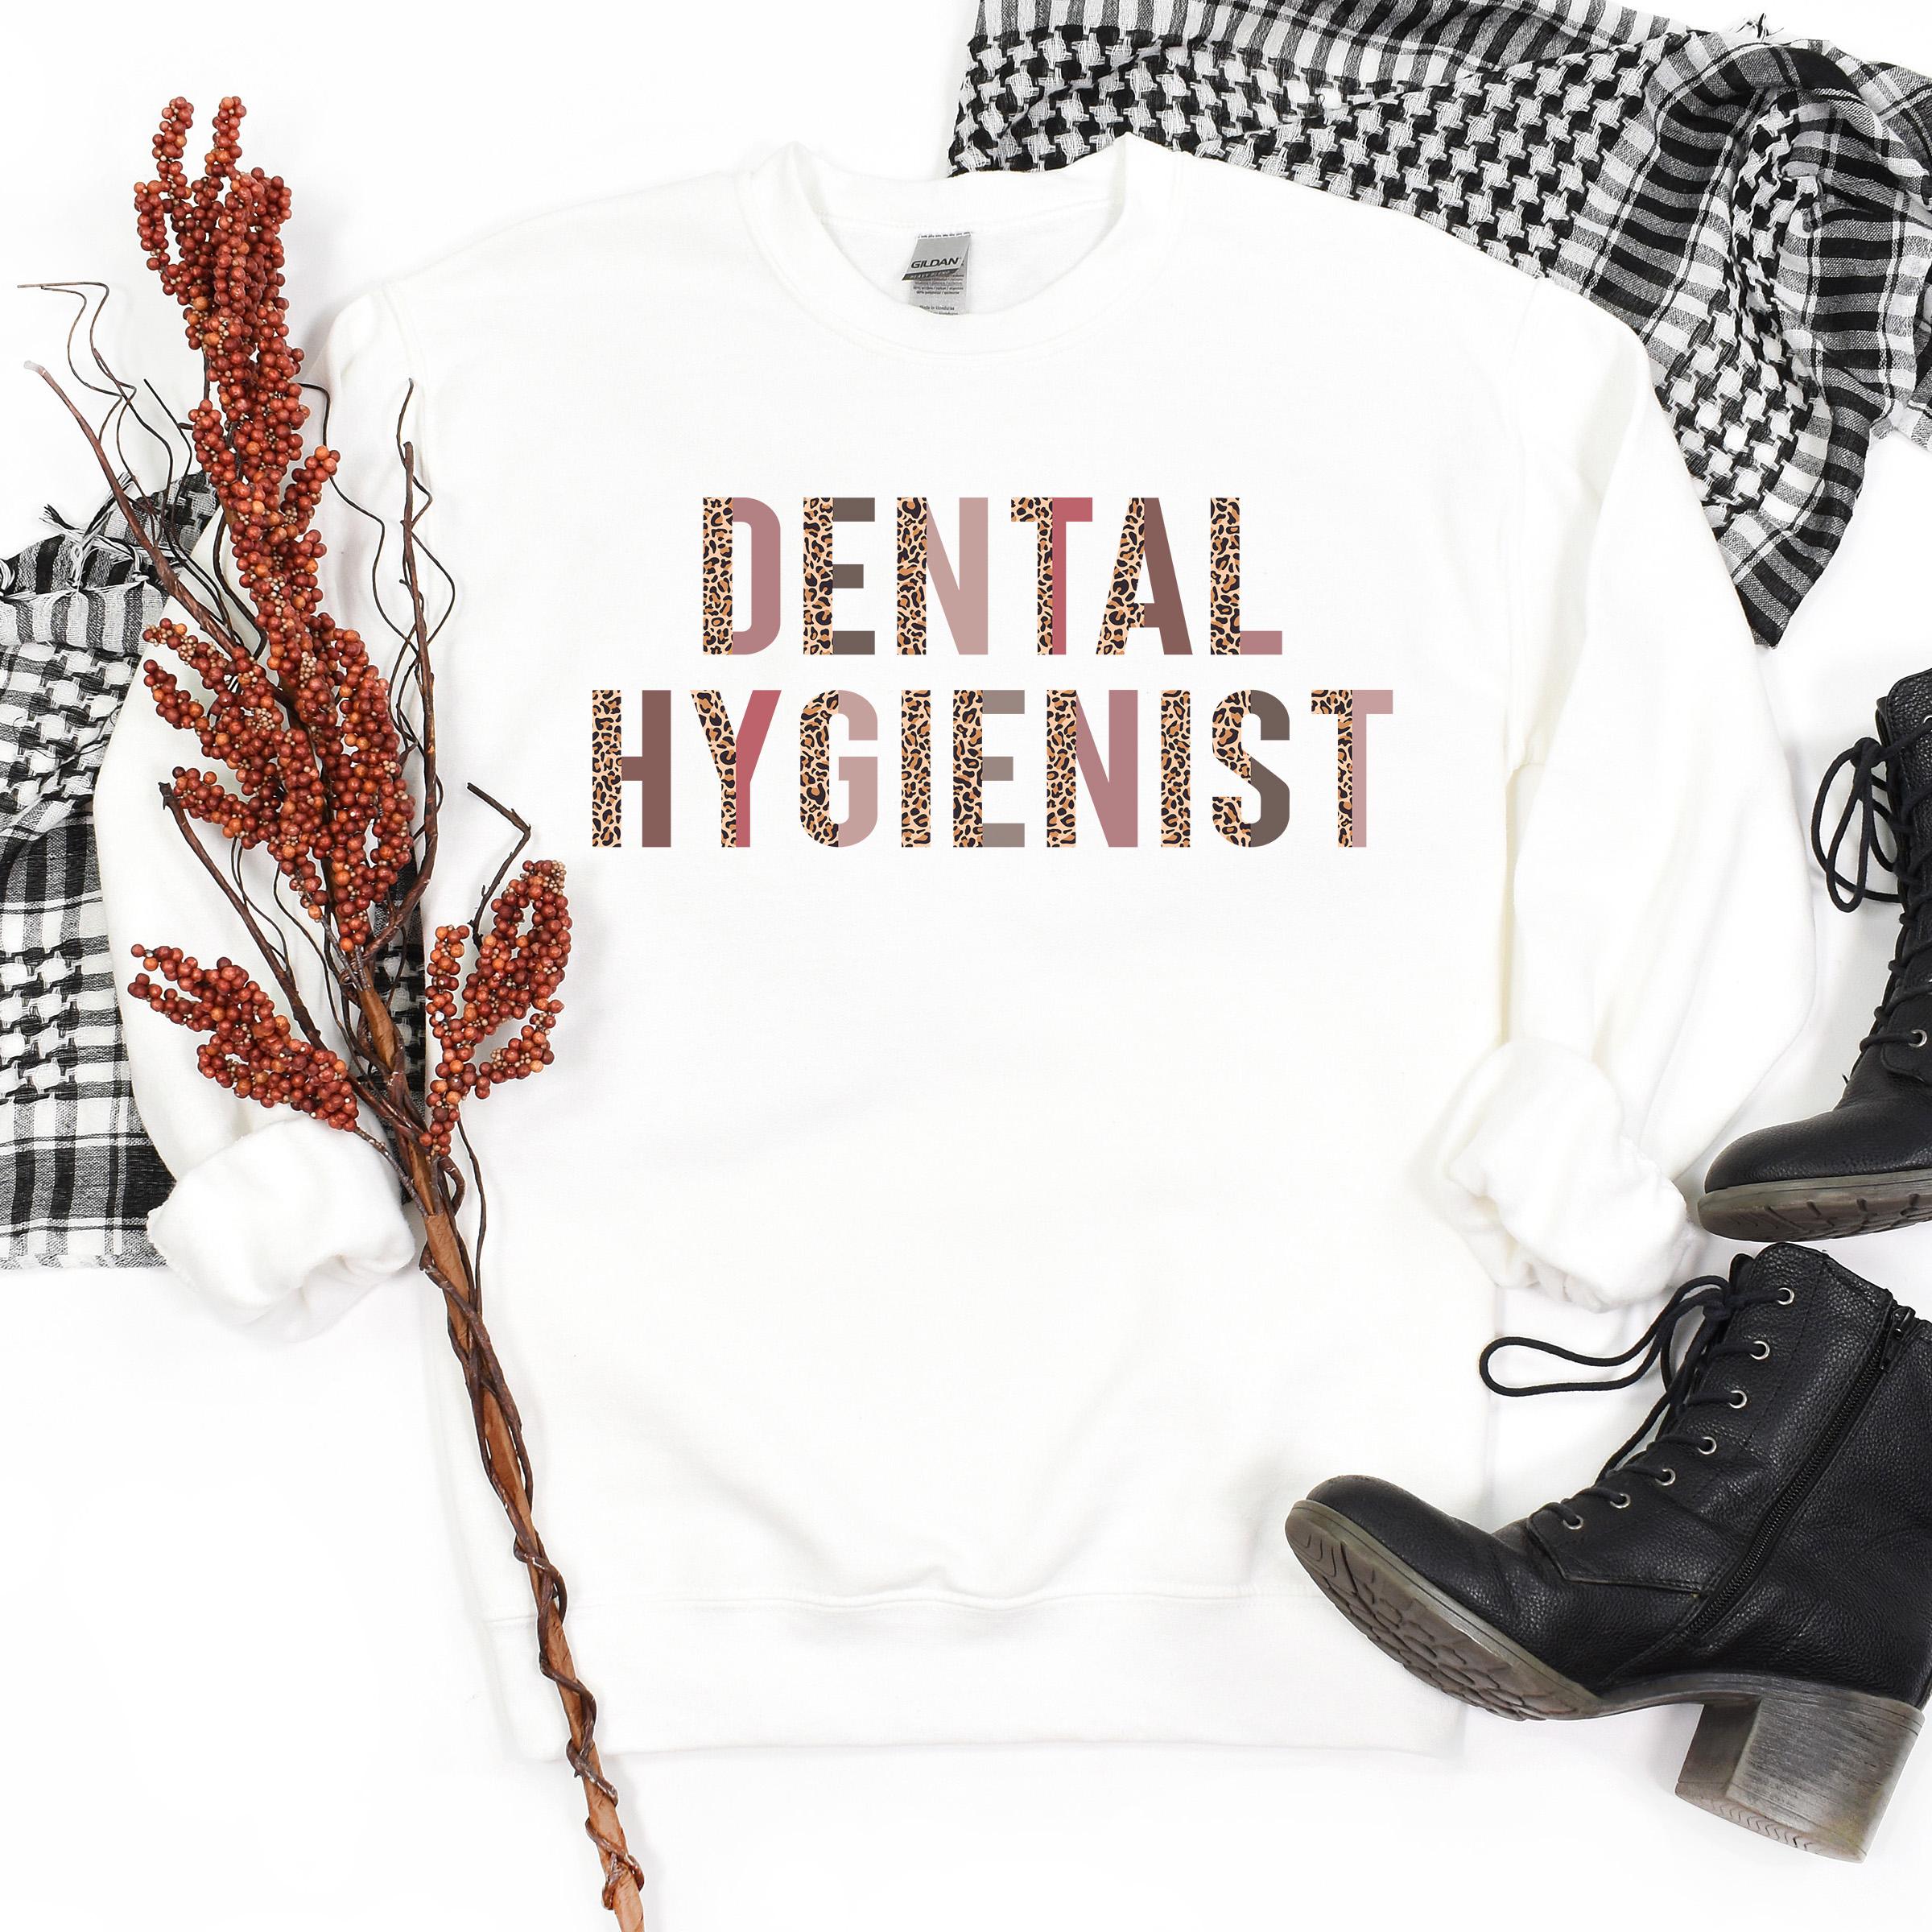 Dental Hygienist Gift   Leopard Print Sweatshirt   RDH   DH   Dental Hygiene School Student   Oral Health   Unisex Crewneck Sweatshirt